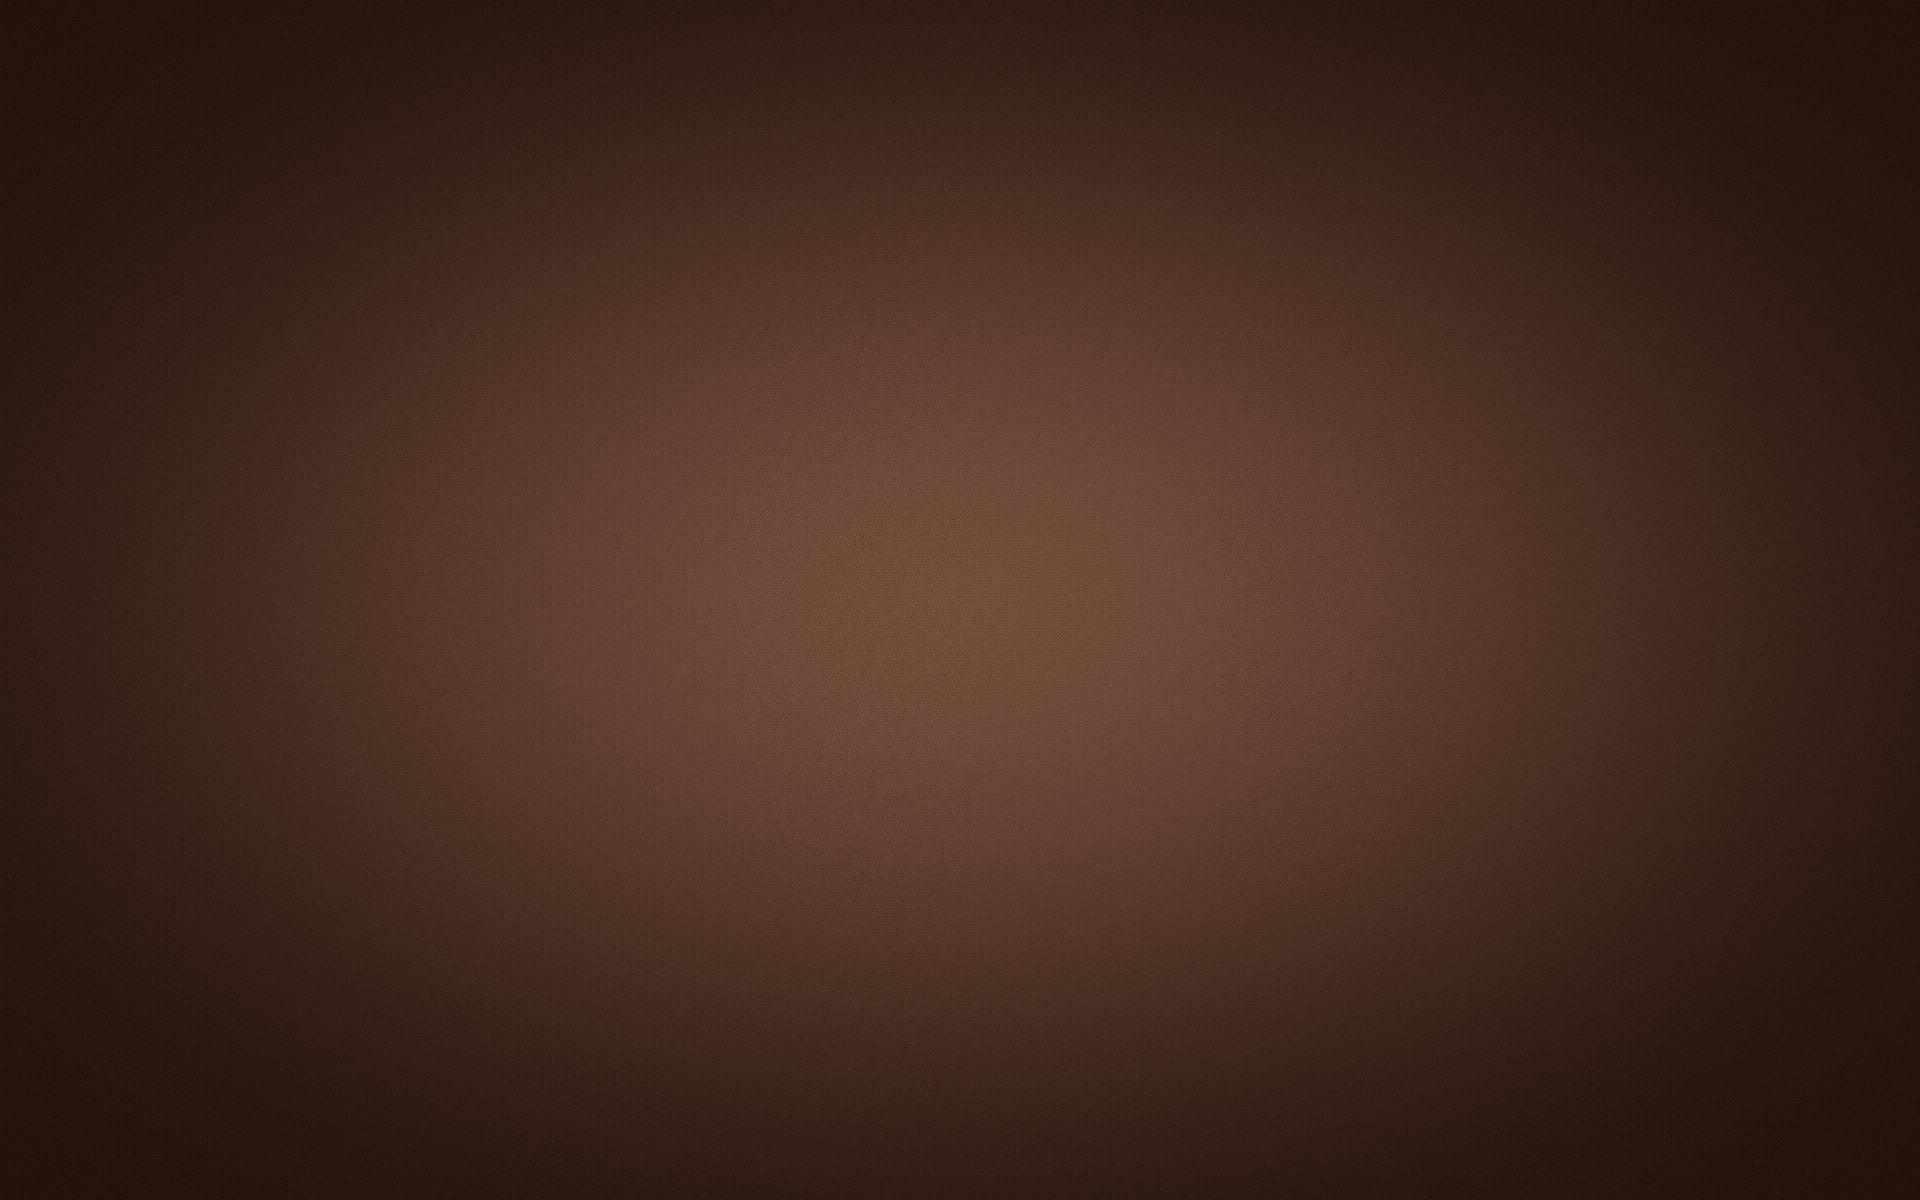 Brown Wallpapers - Wal...